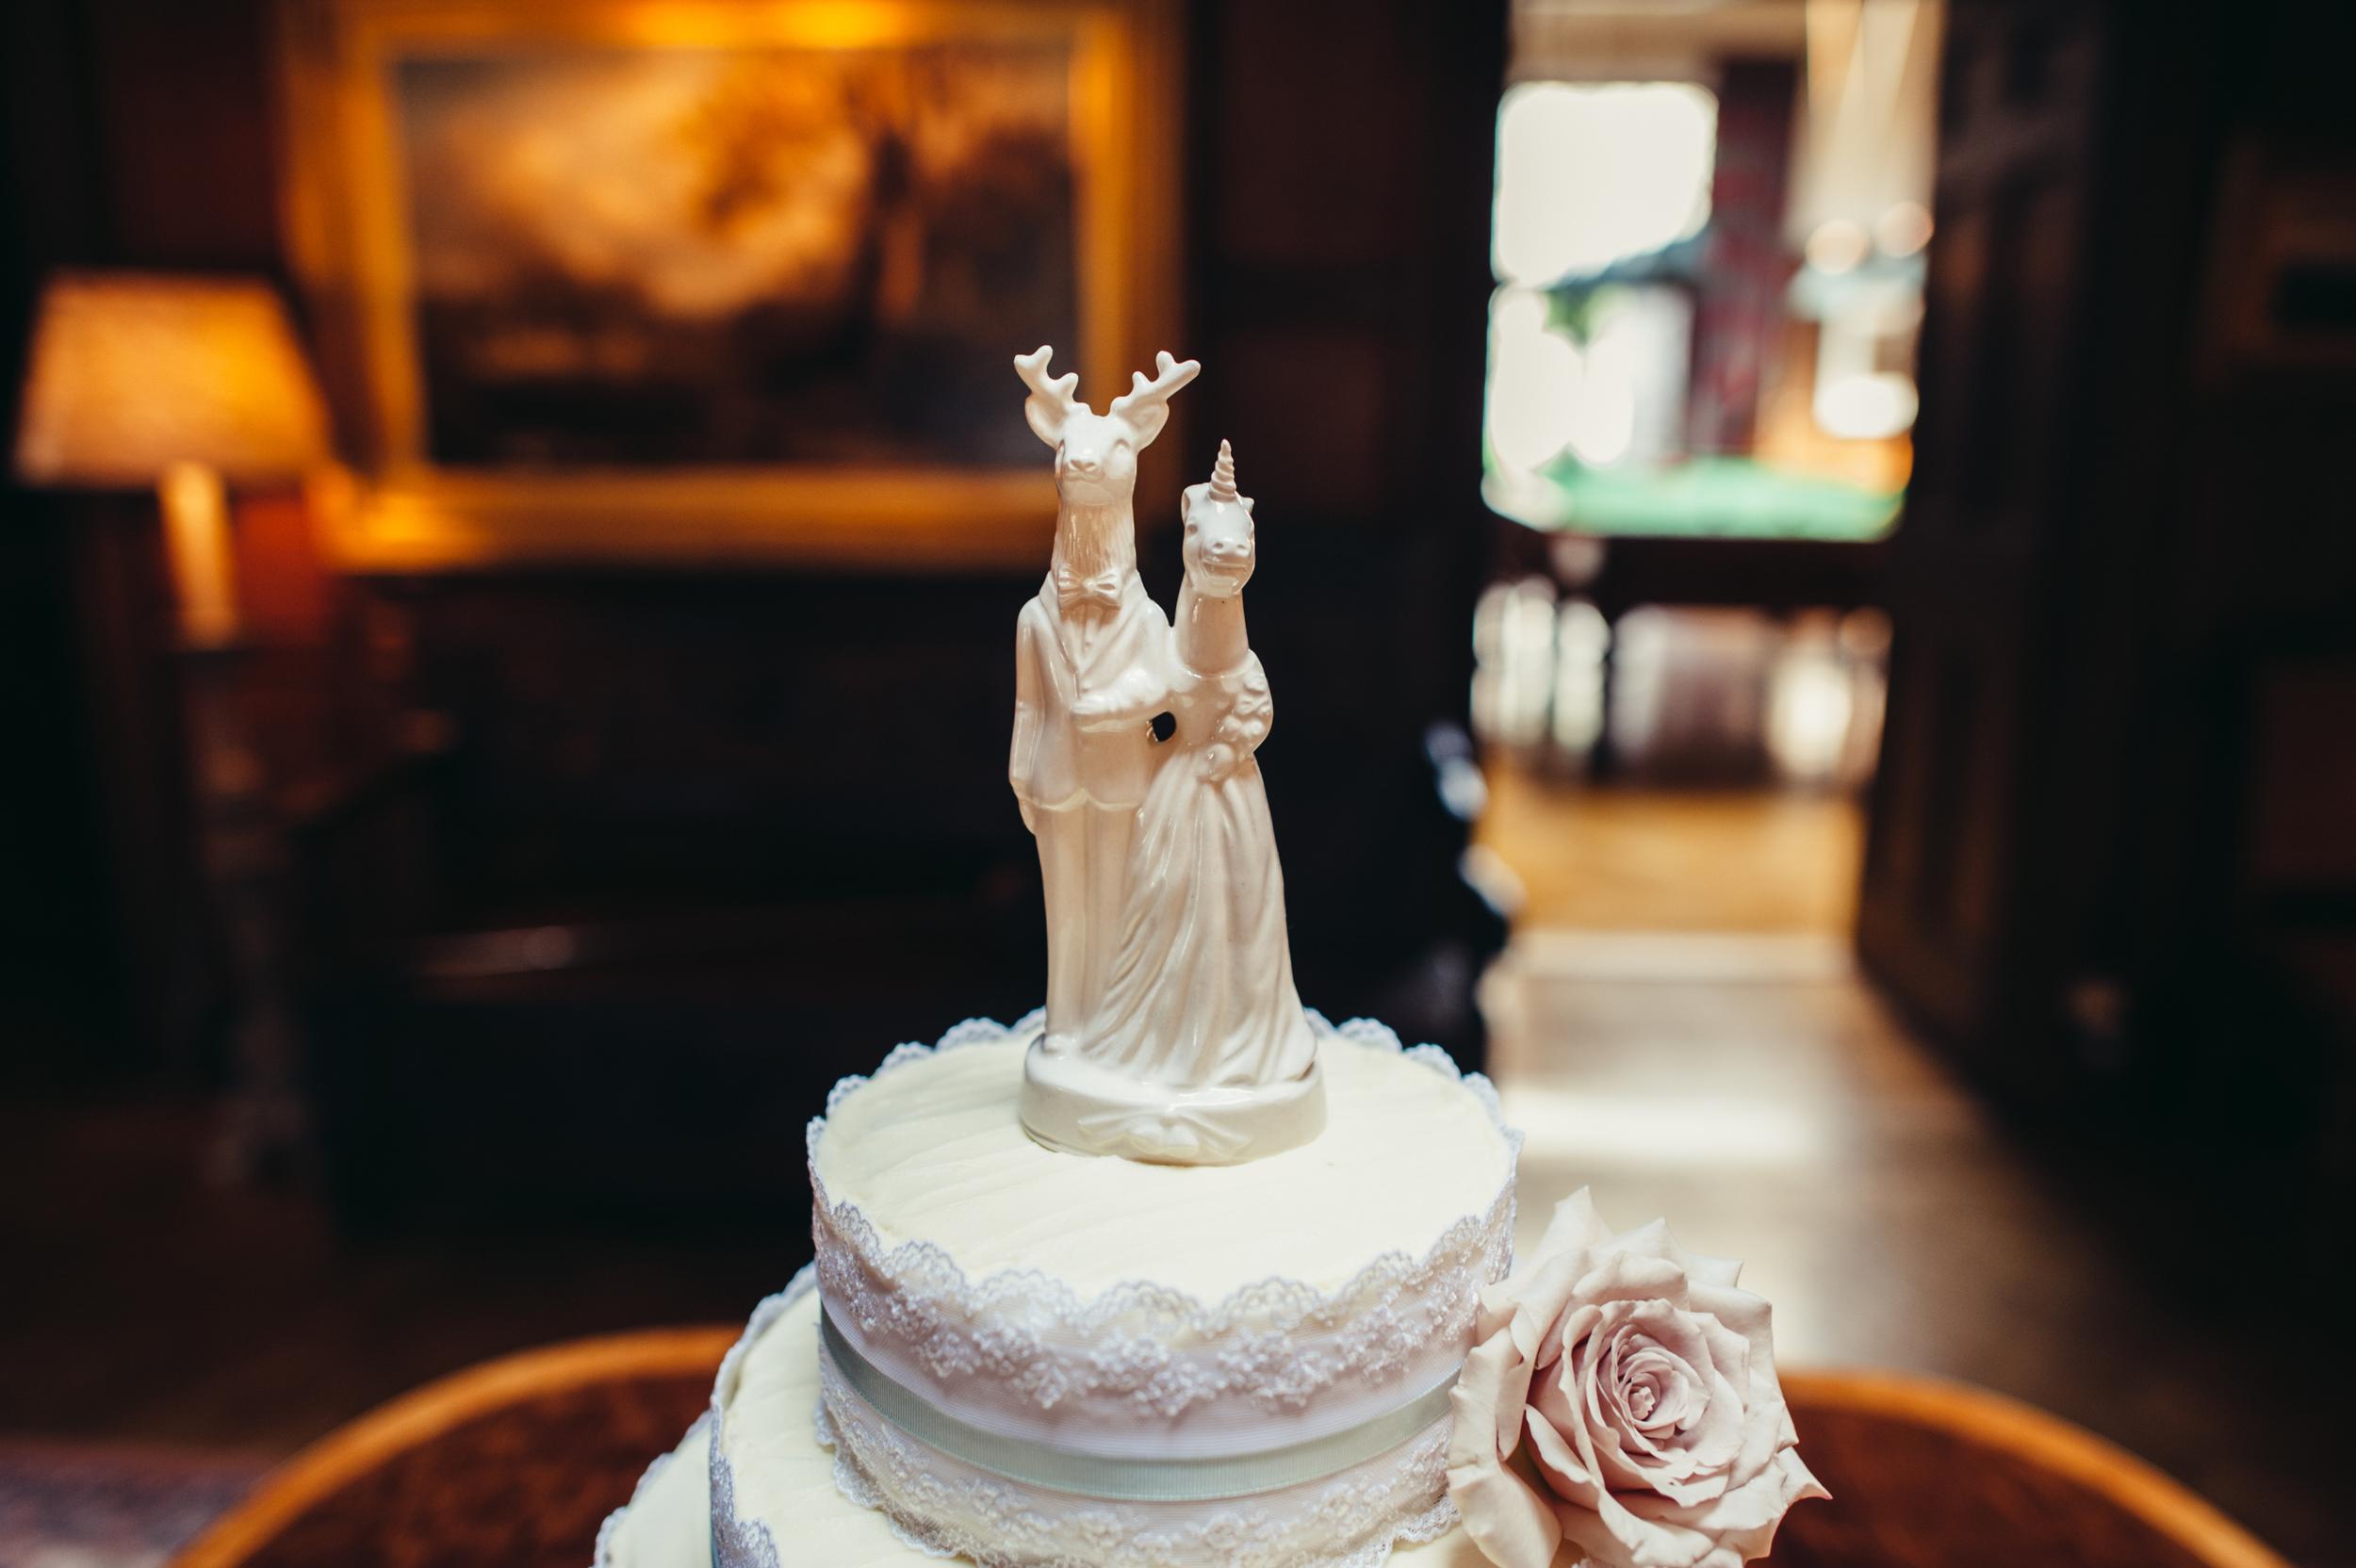 0017-lisa-devine-alternative-creative-wedding-photography-glasgow-edinburgh.JPG